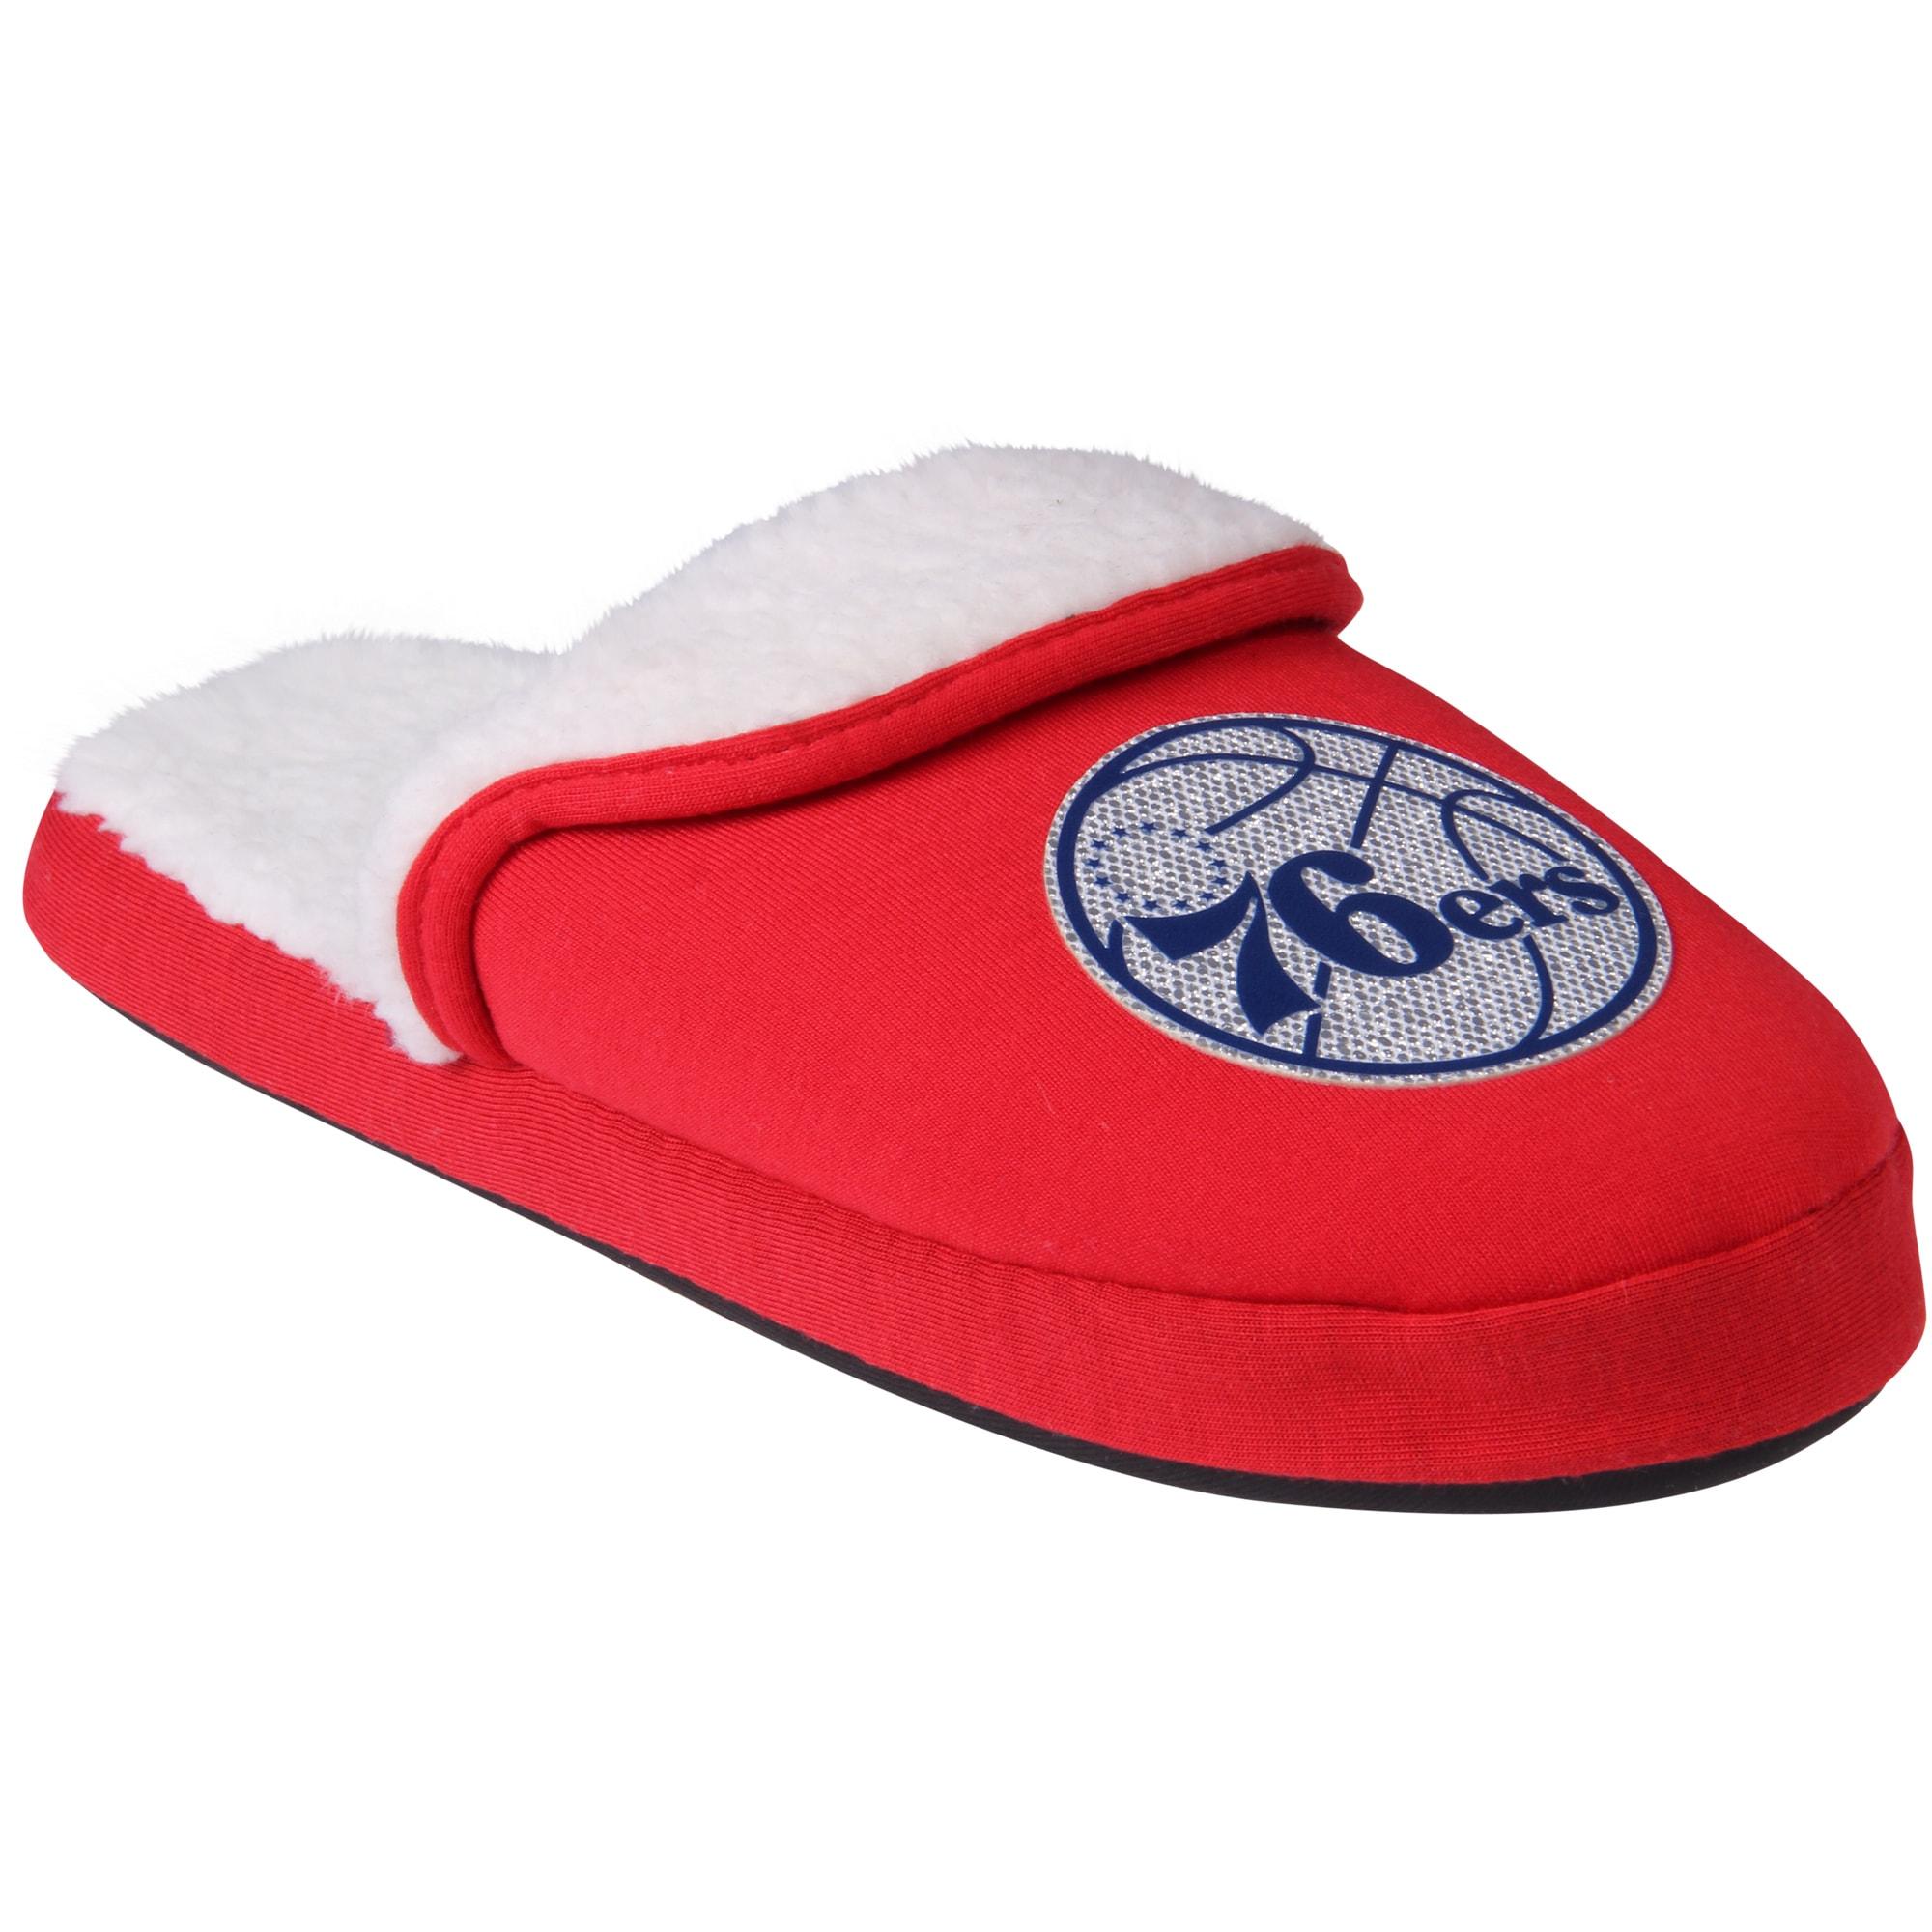 Philadelphia 76ers Women's Glitter Patch Slippers